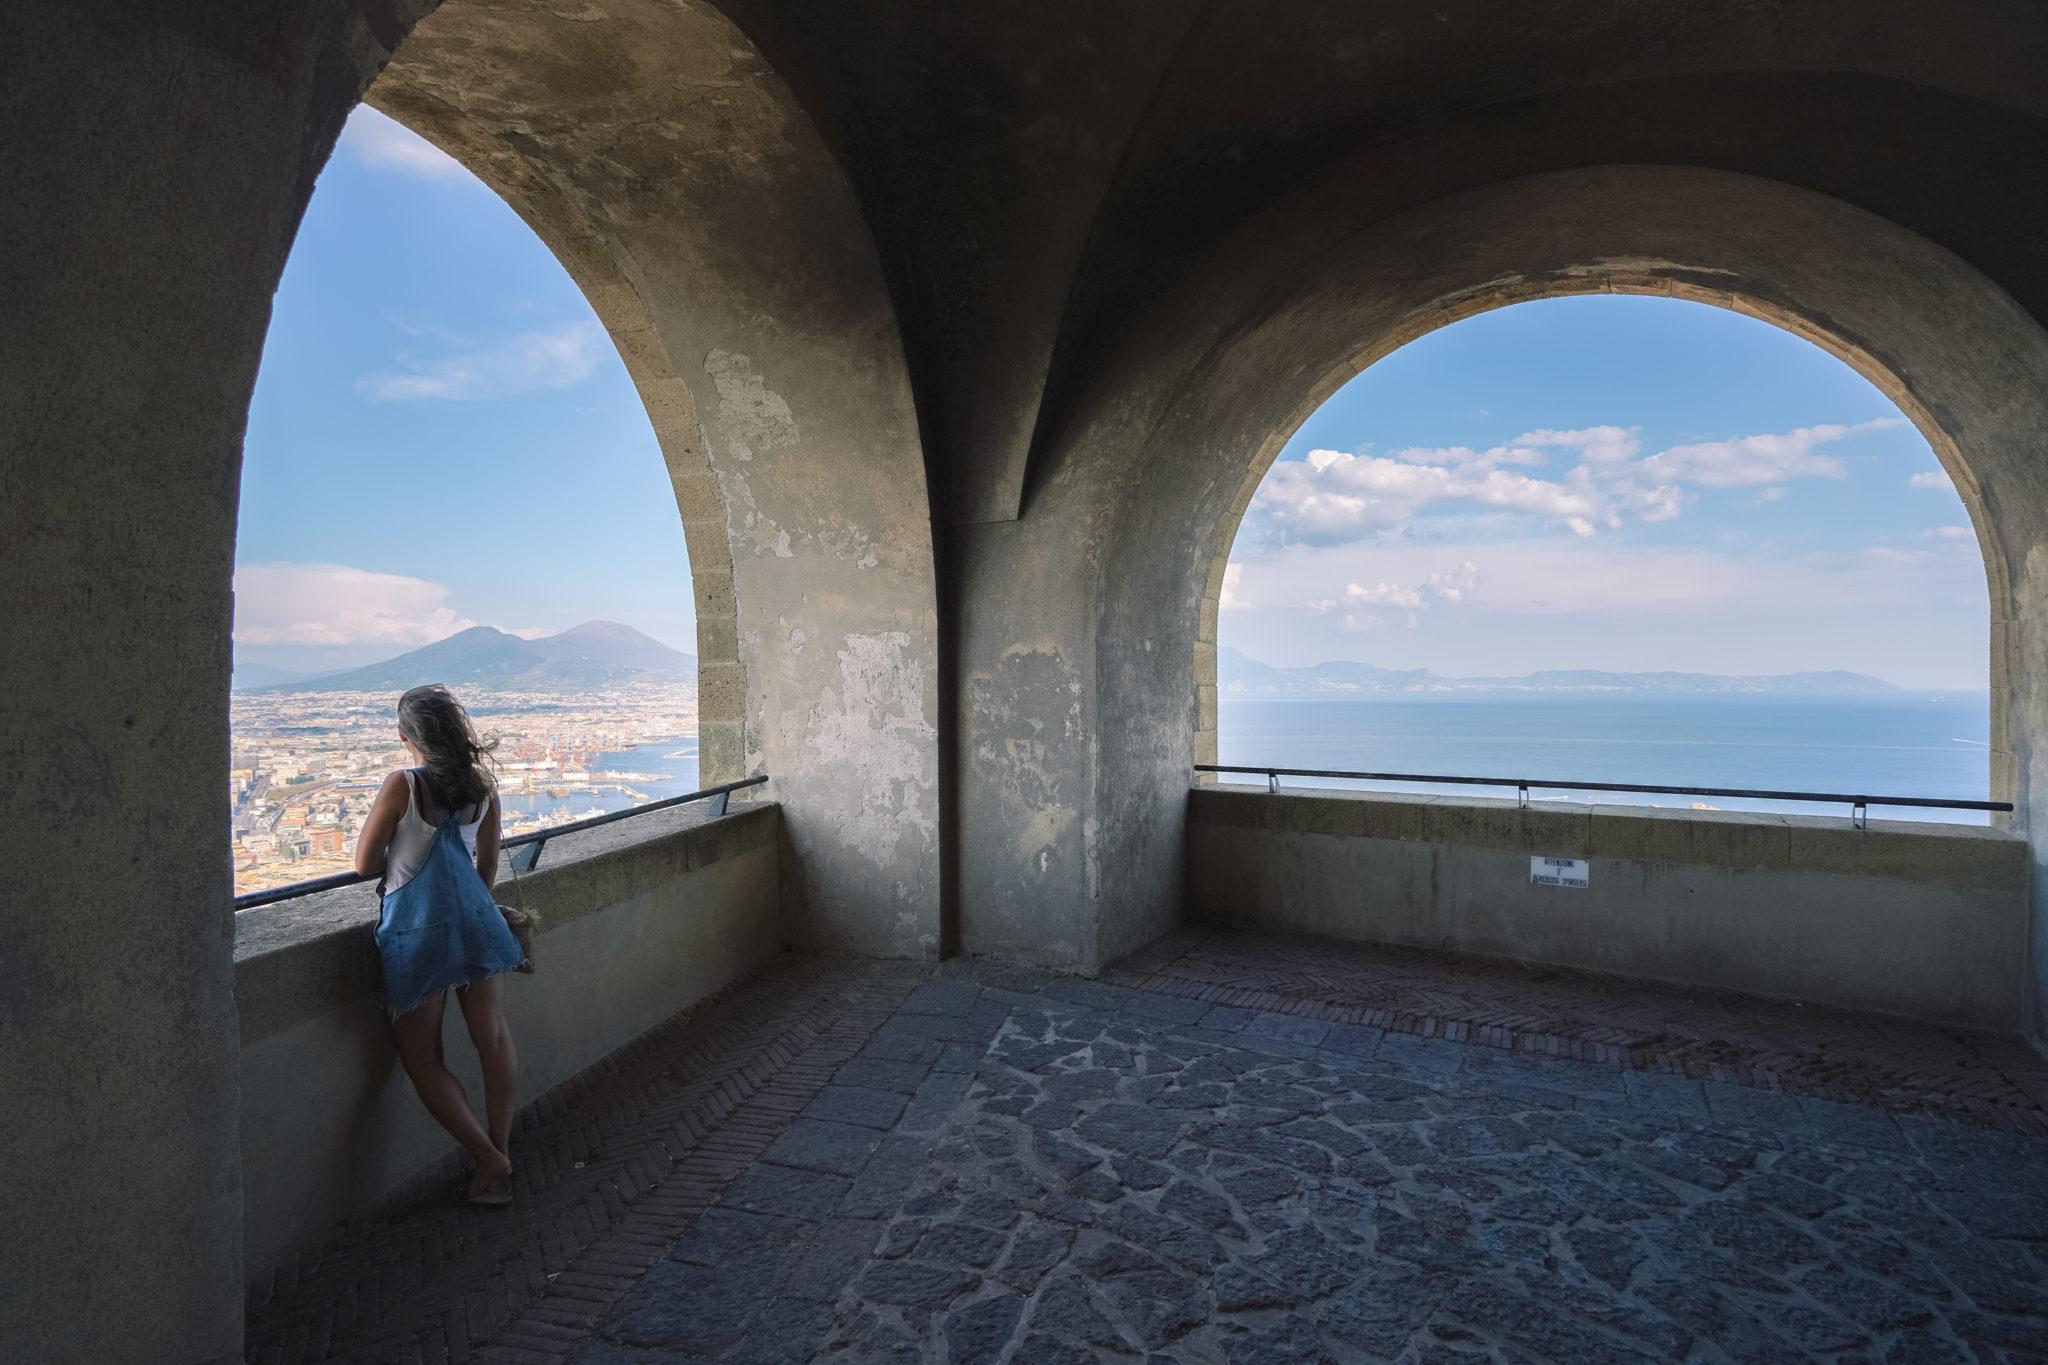 visiter-naples-city-guide-castel-sant-elmo